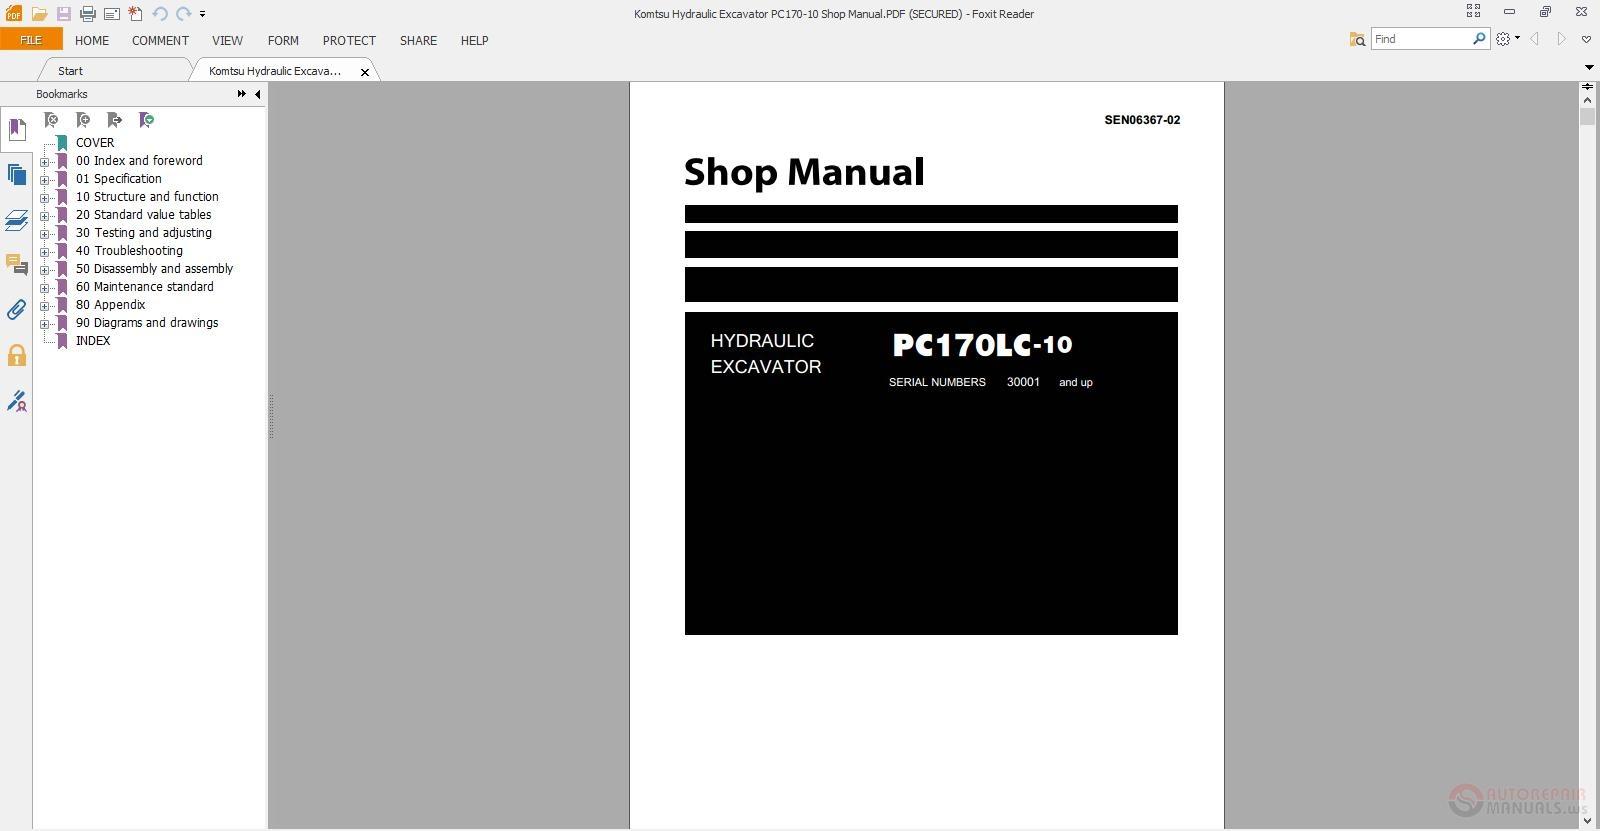 komatsu hydraulic excavator pc170 10 shop manual auto. Black Bedroom Furniture Sets. Home Design Ideas